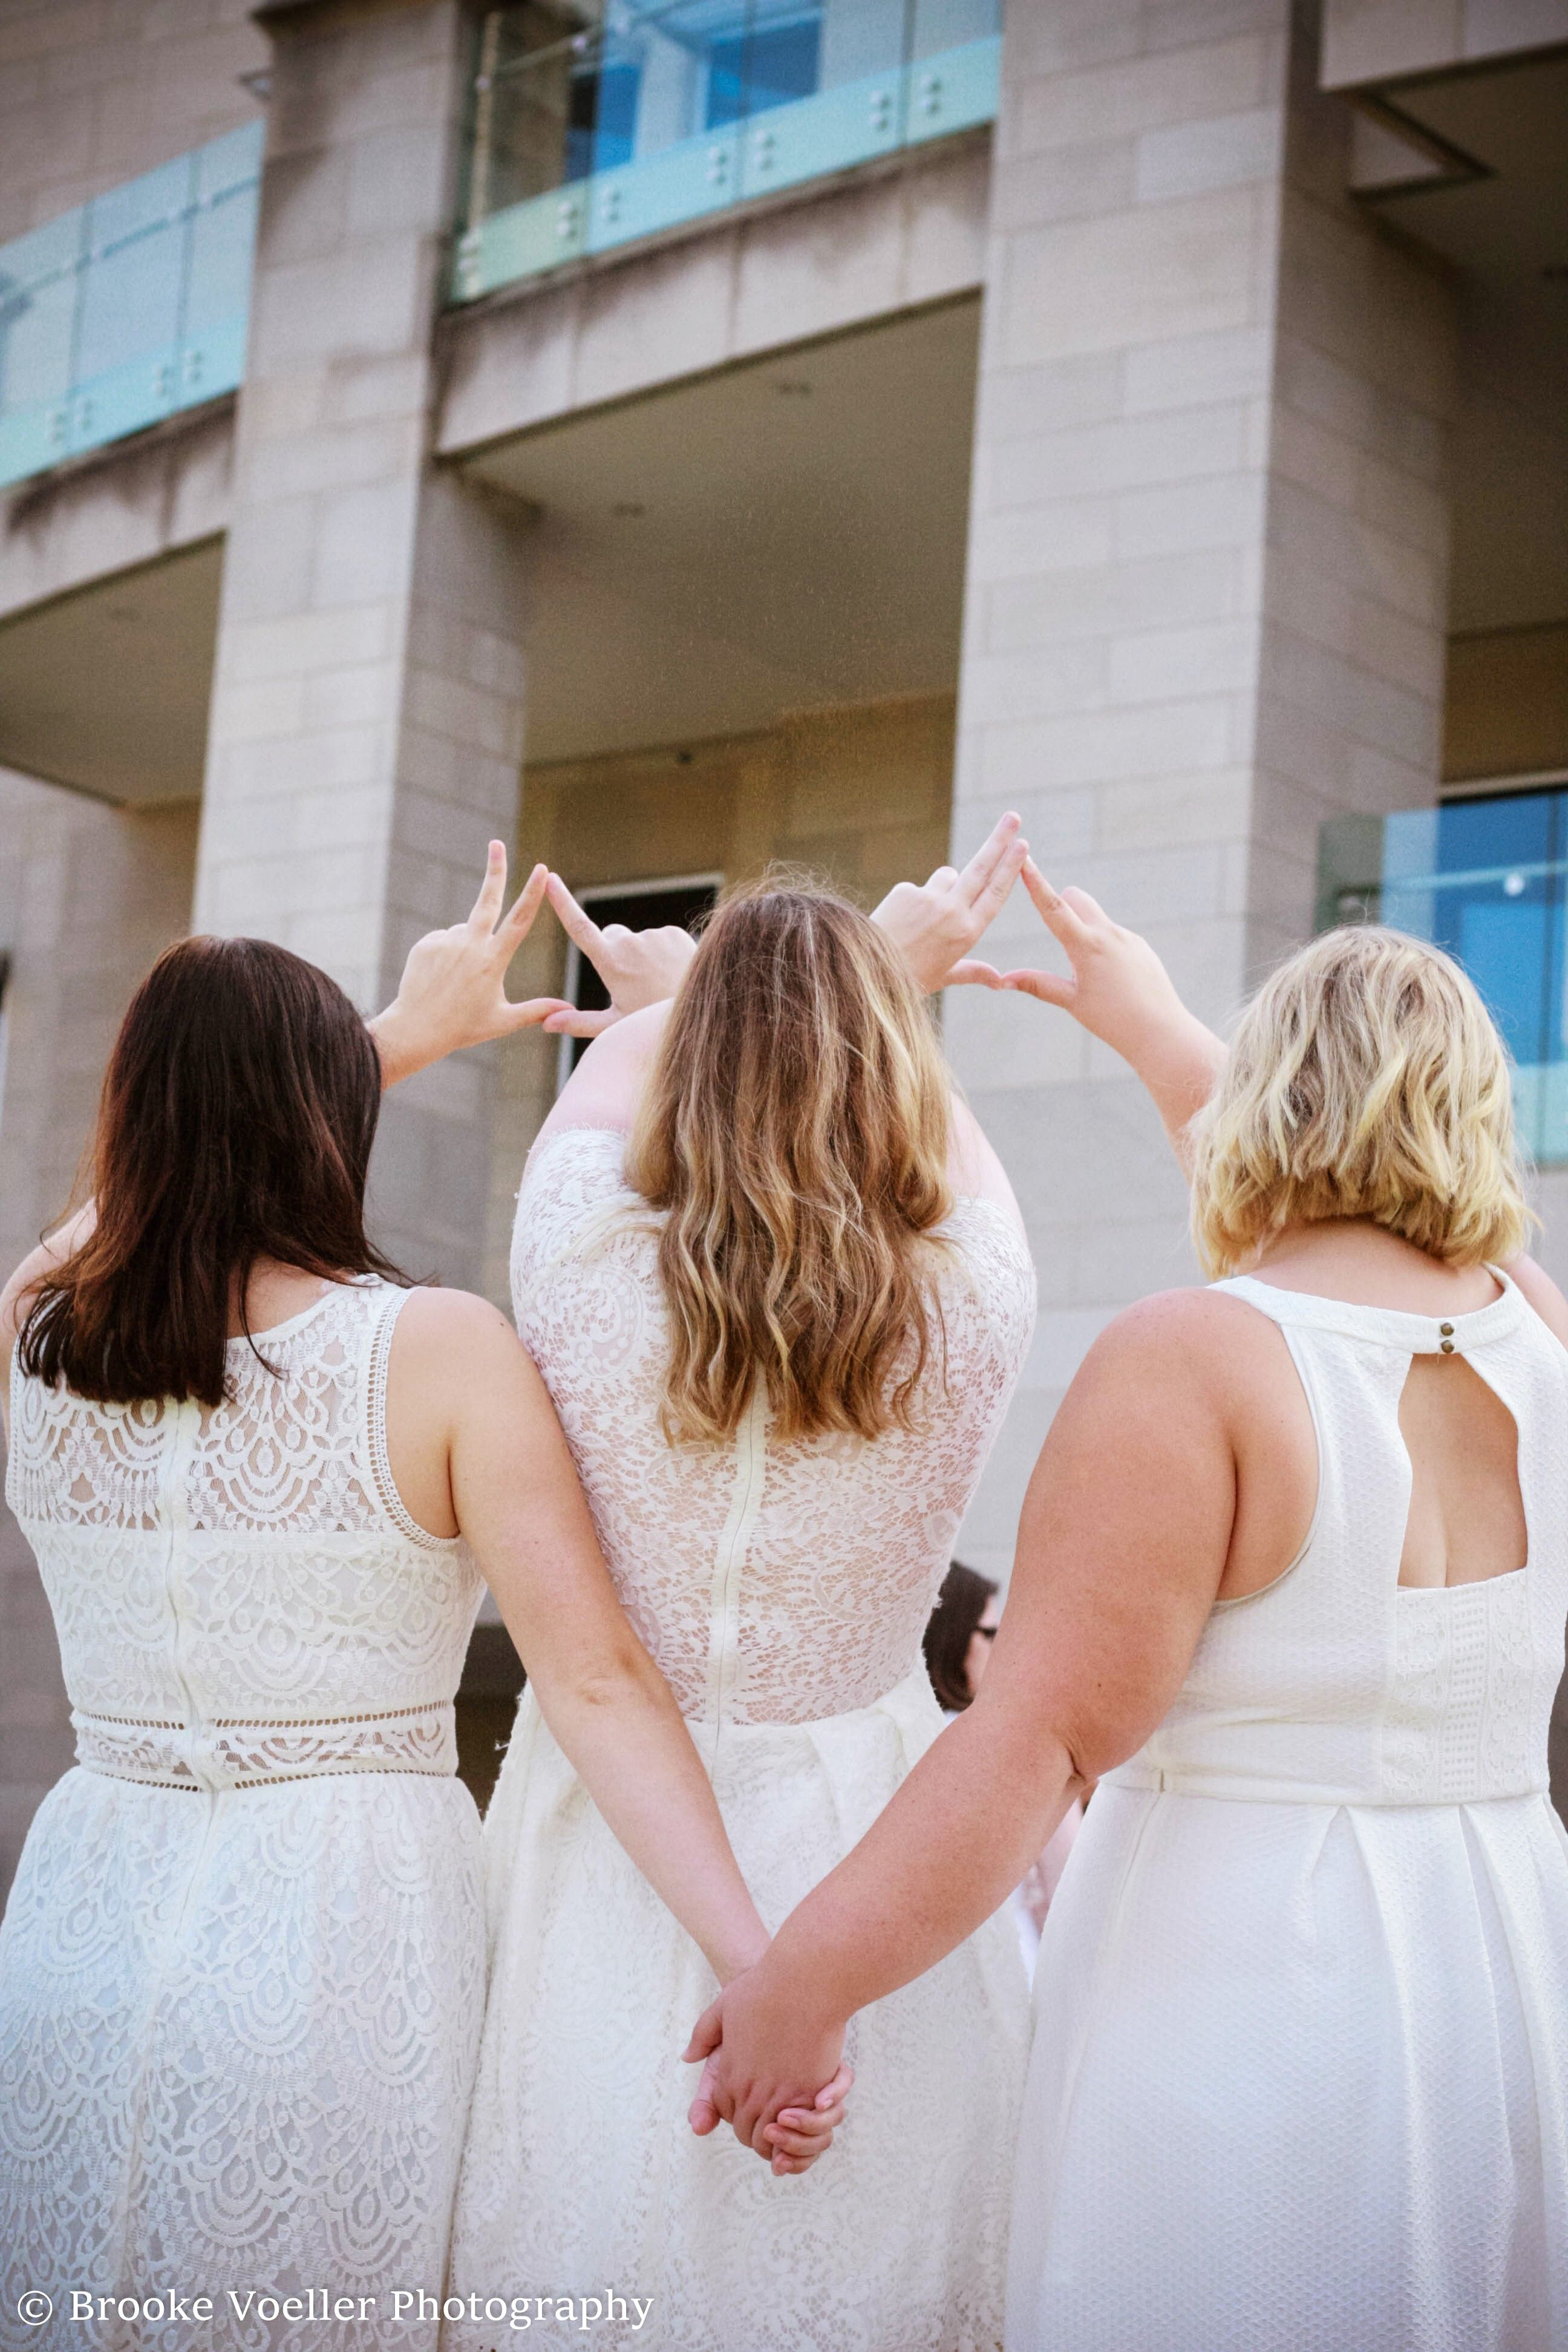 Kappa Delta Photoshoot! See more at facebook.com/brookephoto #photography #kappadelta #sorority #photoshoot #recruitment #greeklife #greek #college #poses